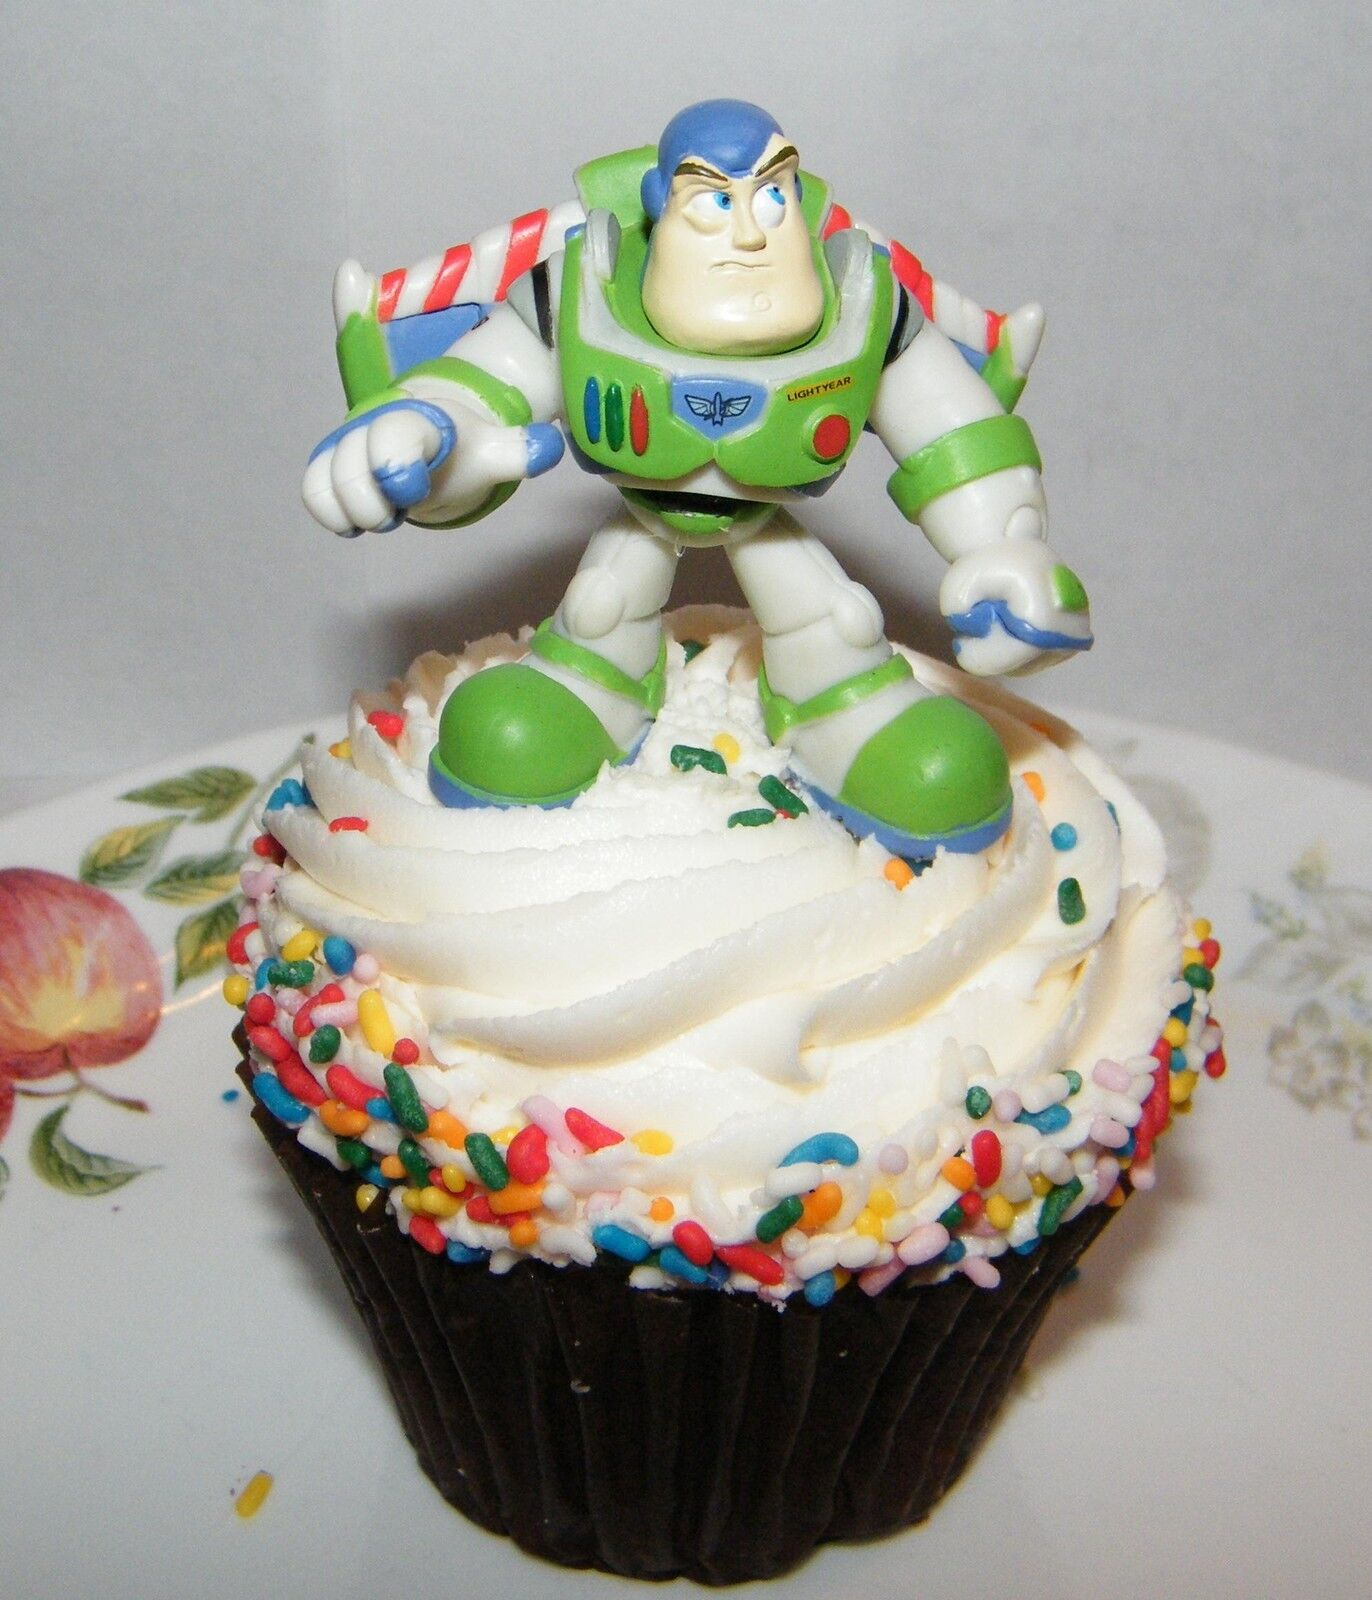 Disney Pixar Toy Story Monsters Inc Incredibles Cake ...